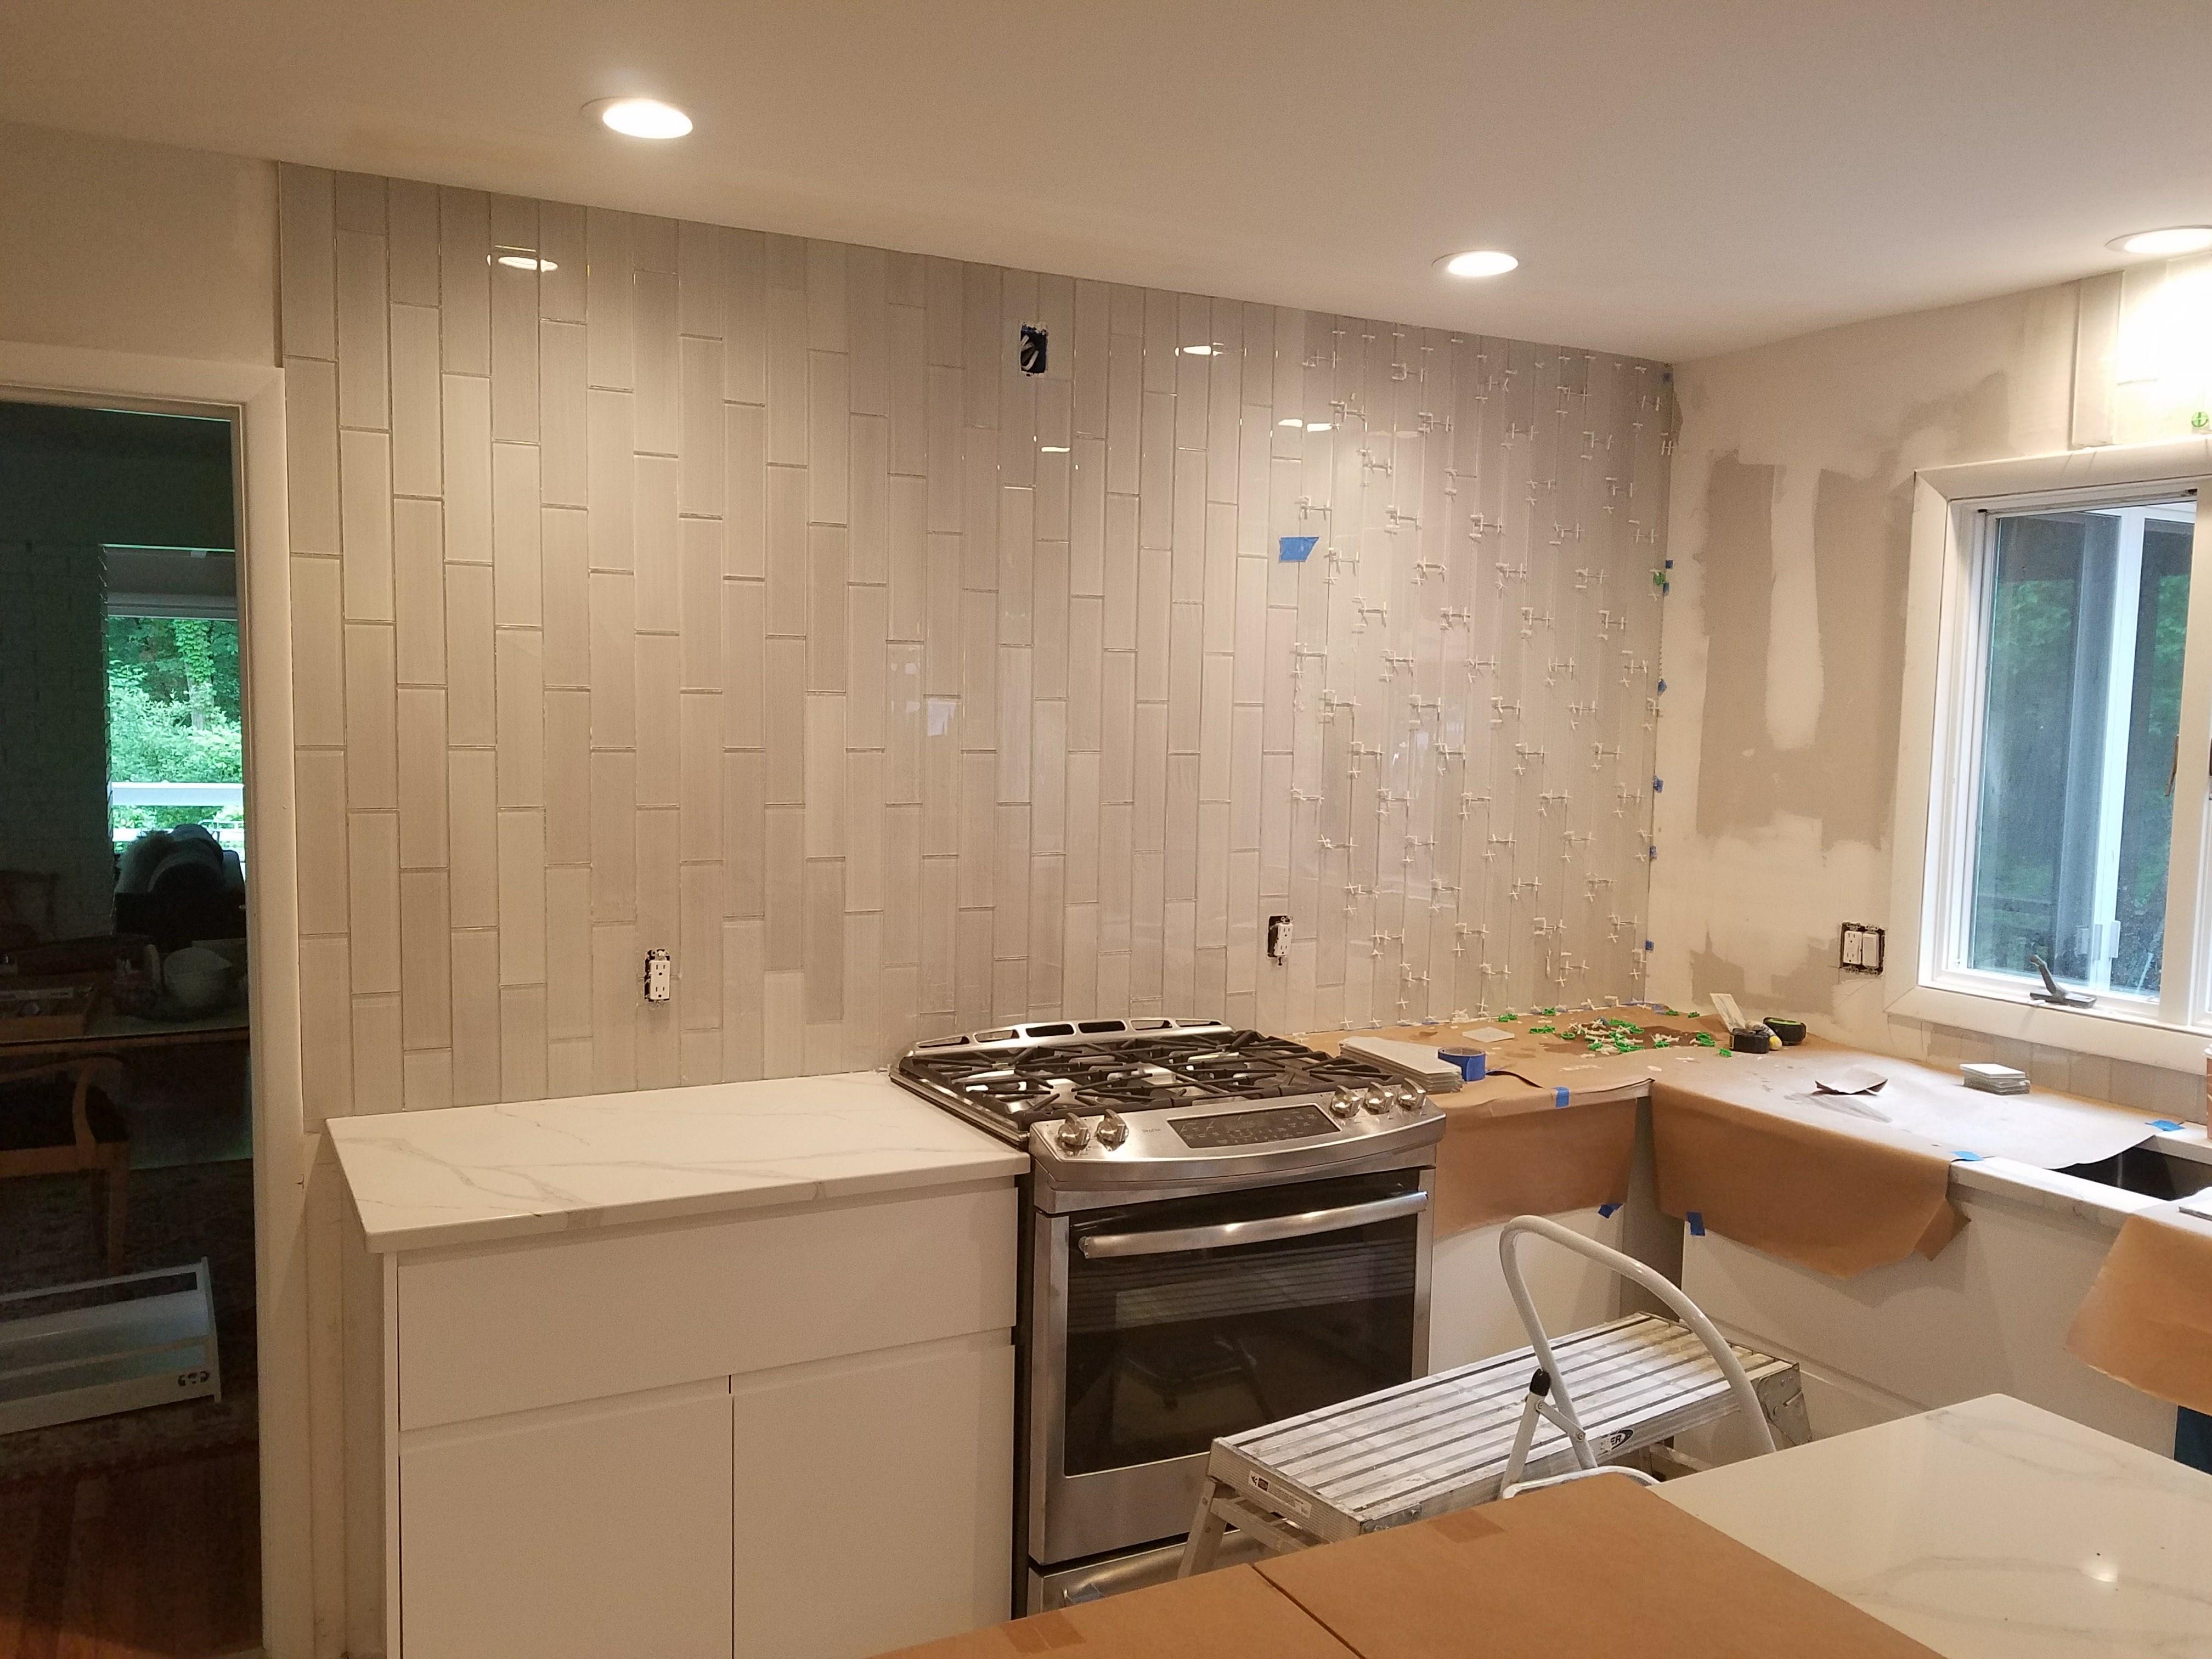 Bathroom tile layout-20170606_130049.jpg